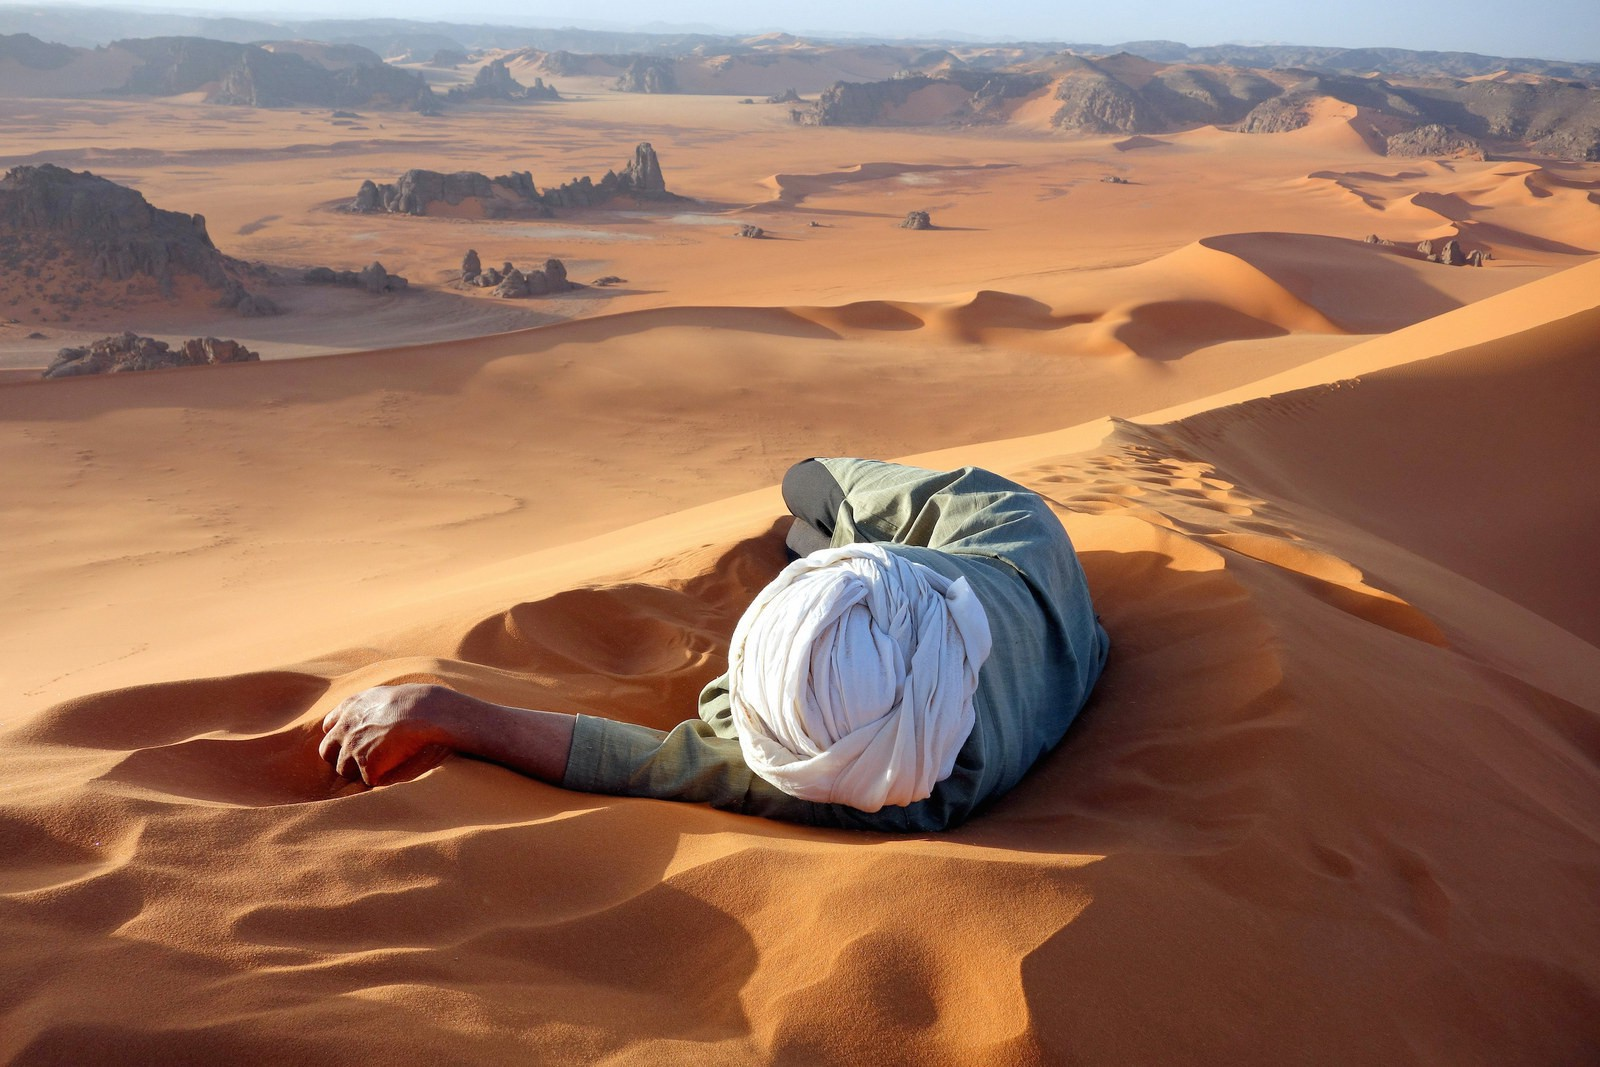 Wallpaper Landscape People Rock Nature Sky Desert Canyon Dune Sahara Formation Vacation Material 1600x1067 Px Geology Wadi Aeolian Landform Erg Ecoregion Singing Sand 1600x1067 Wallhaven 791876 Hd Wallpapers Wallhere